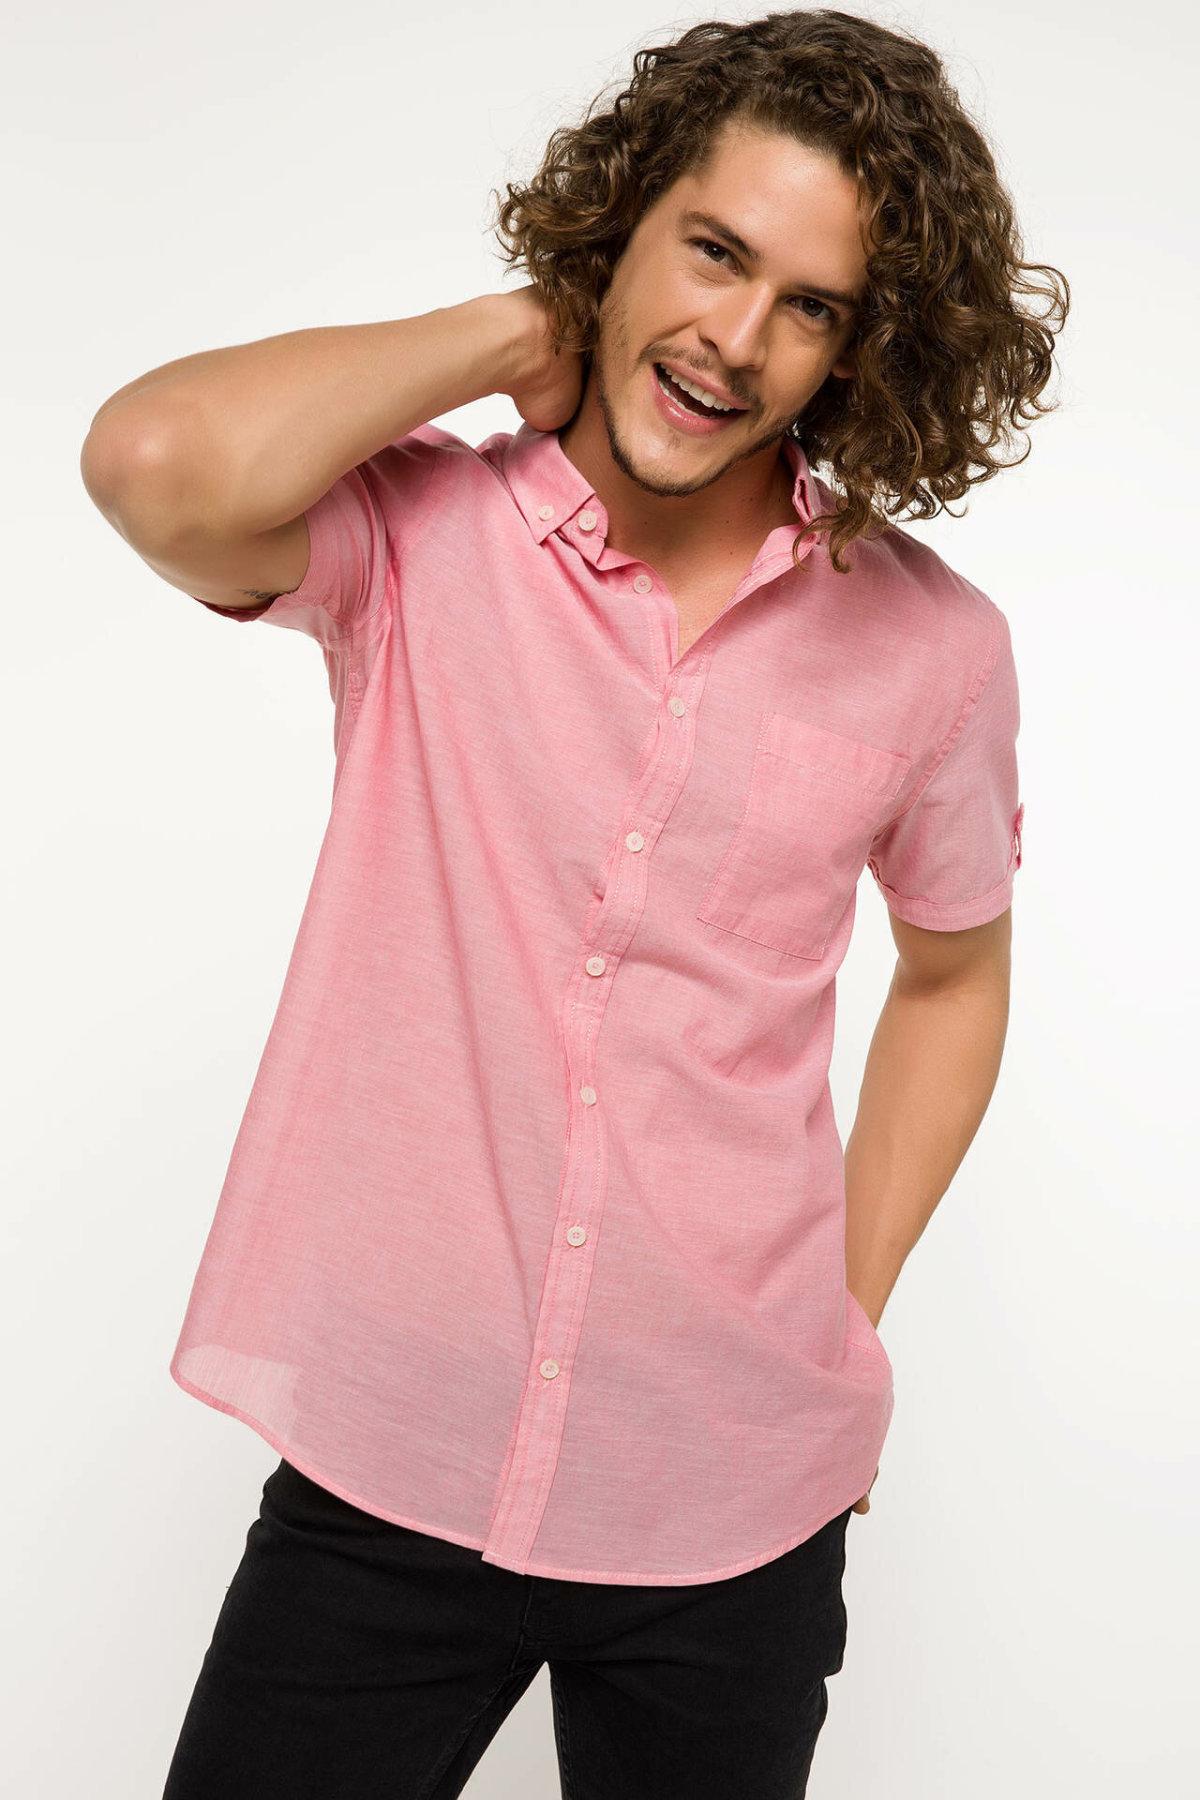 DeFacto Men Fashion Simple Shirts Short Sleeve Solid Shirts Mens Casual Lapel Collar Casual Shirt New - I3041AZ18SMRD38-I3041AZ18SM